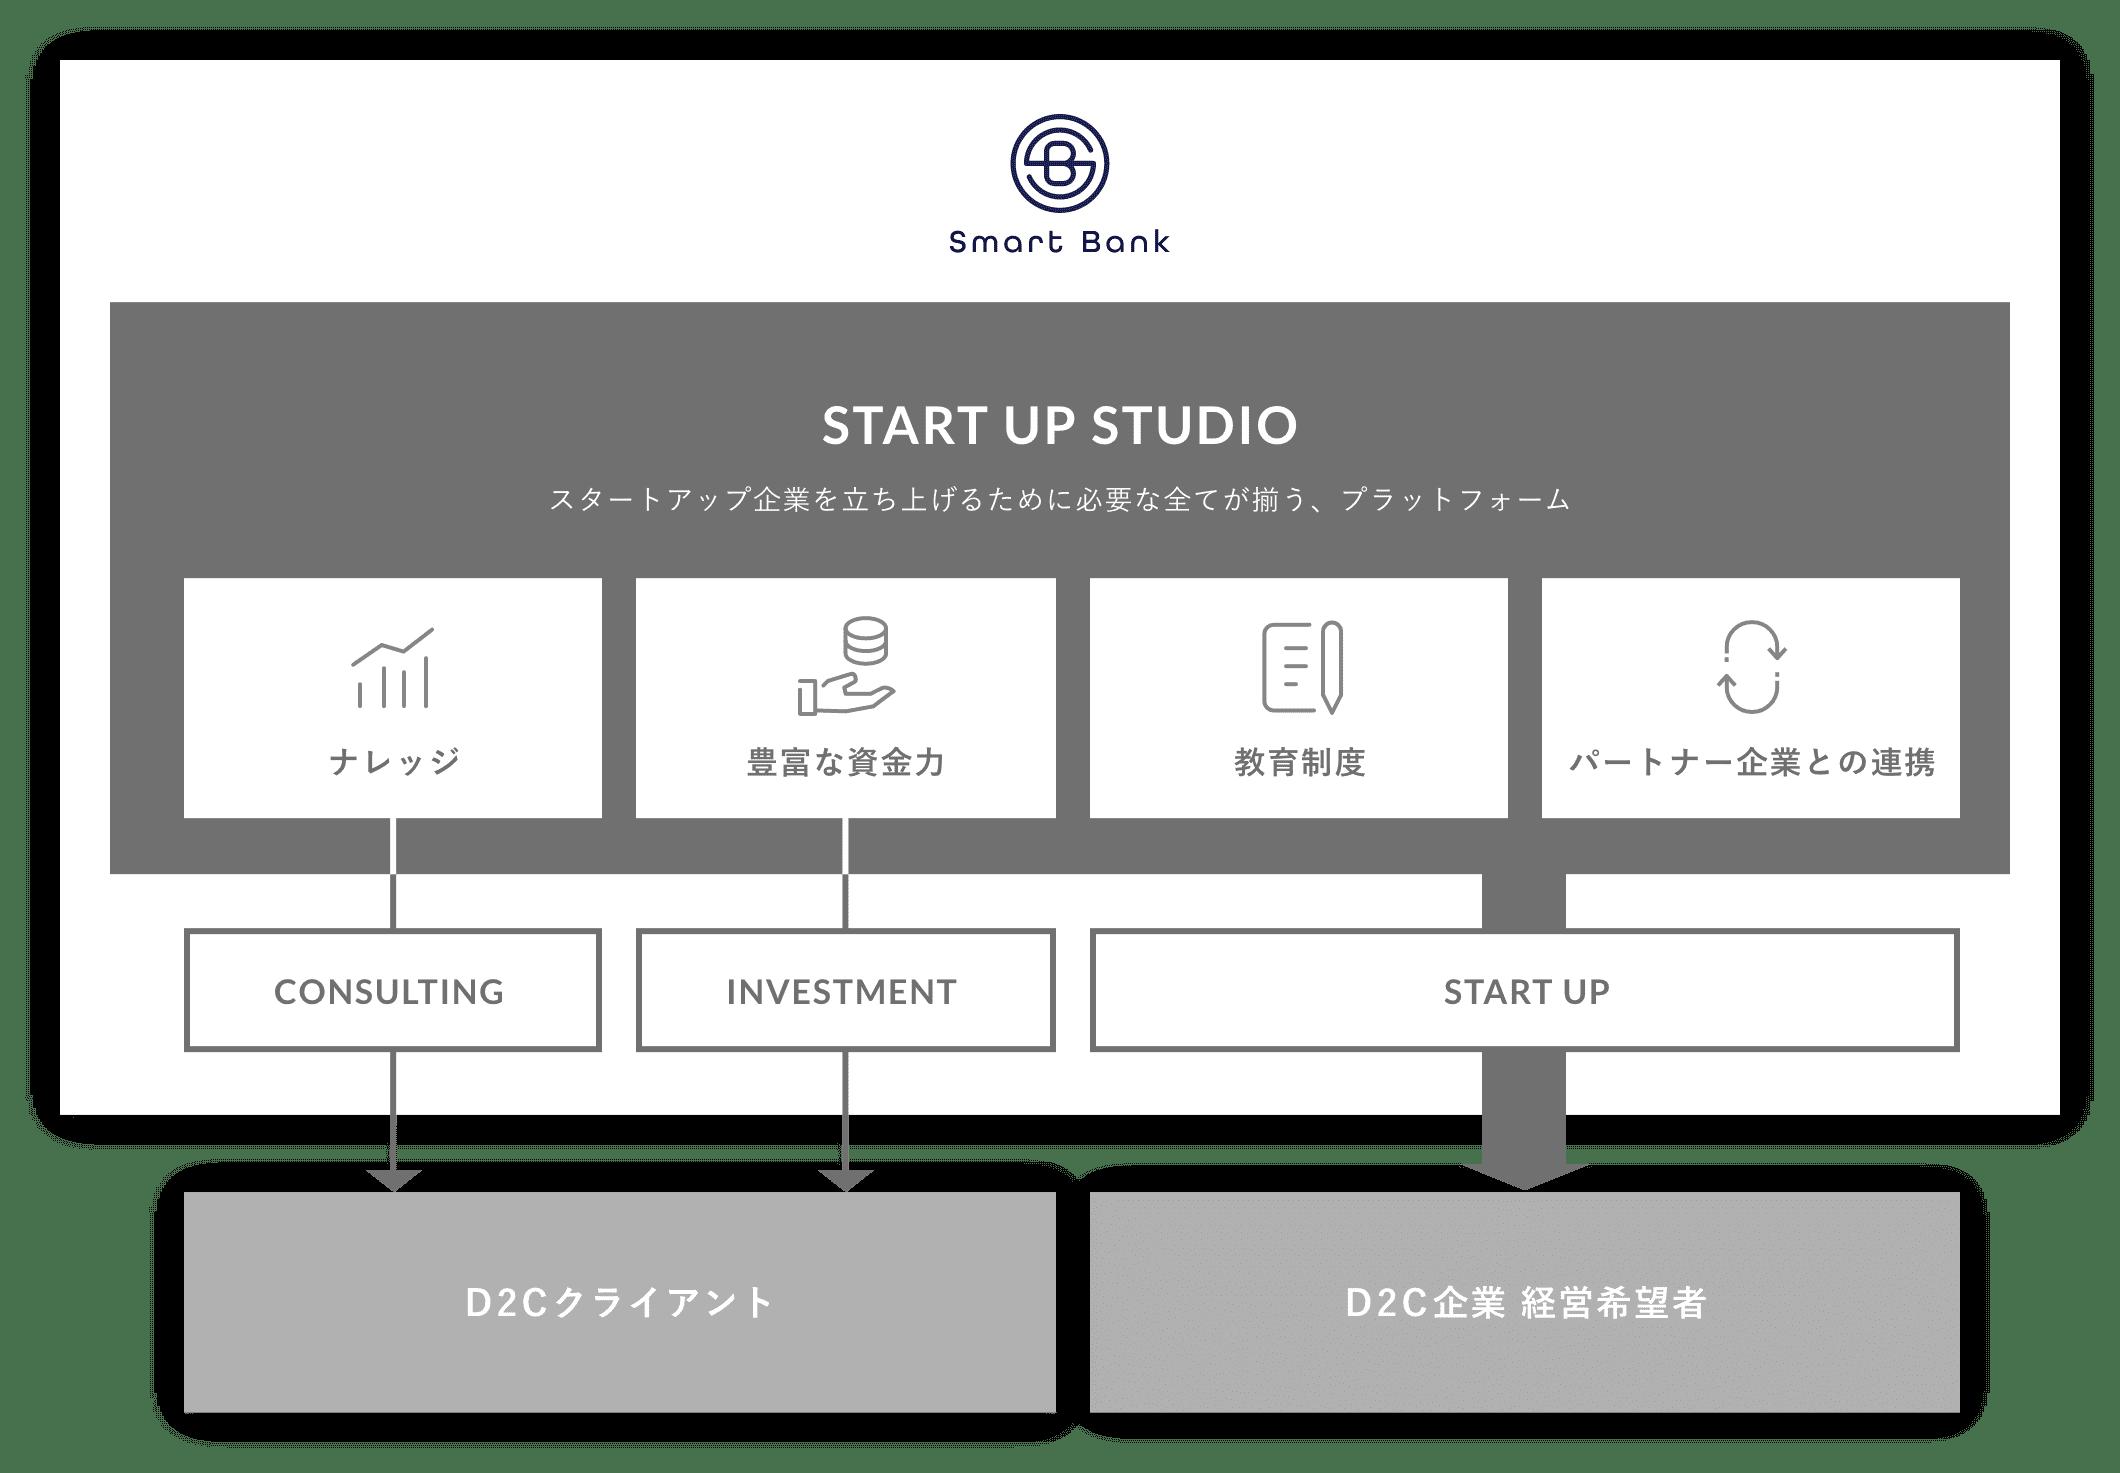 Smart Bankの事業概要の図